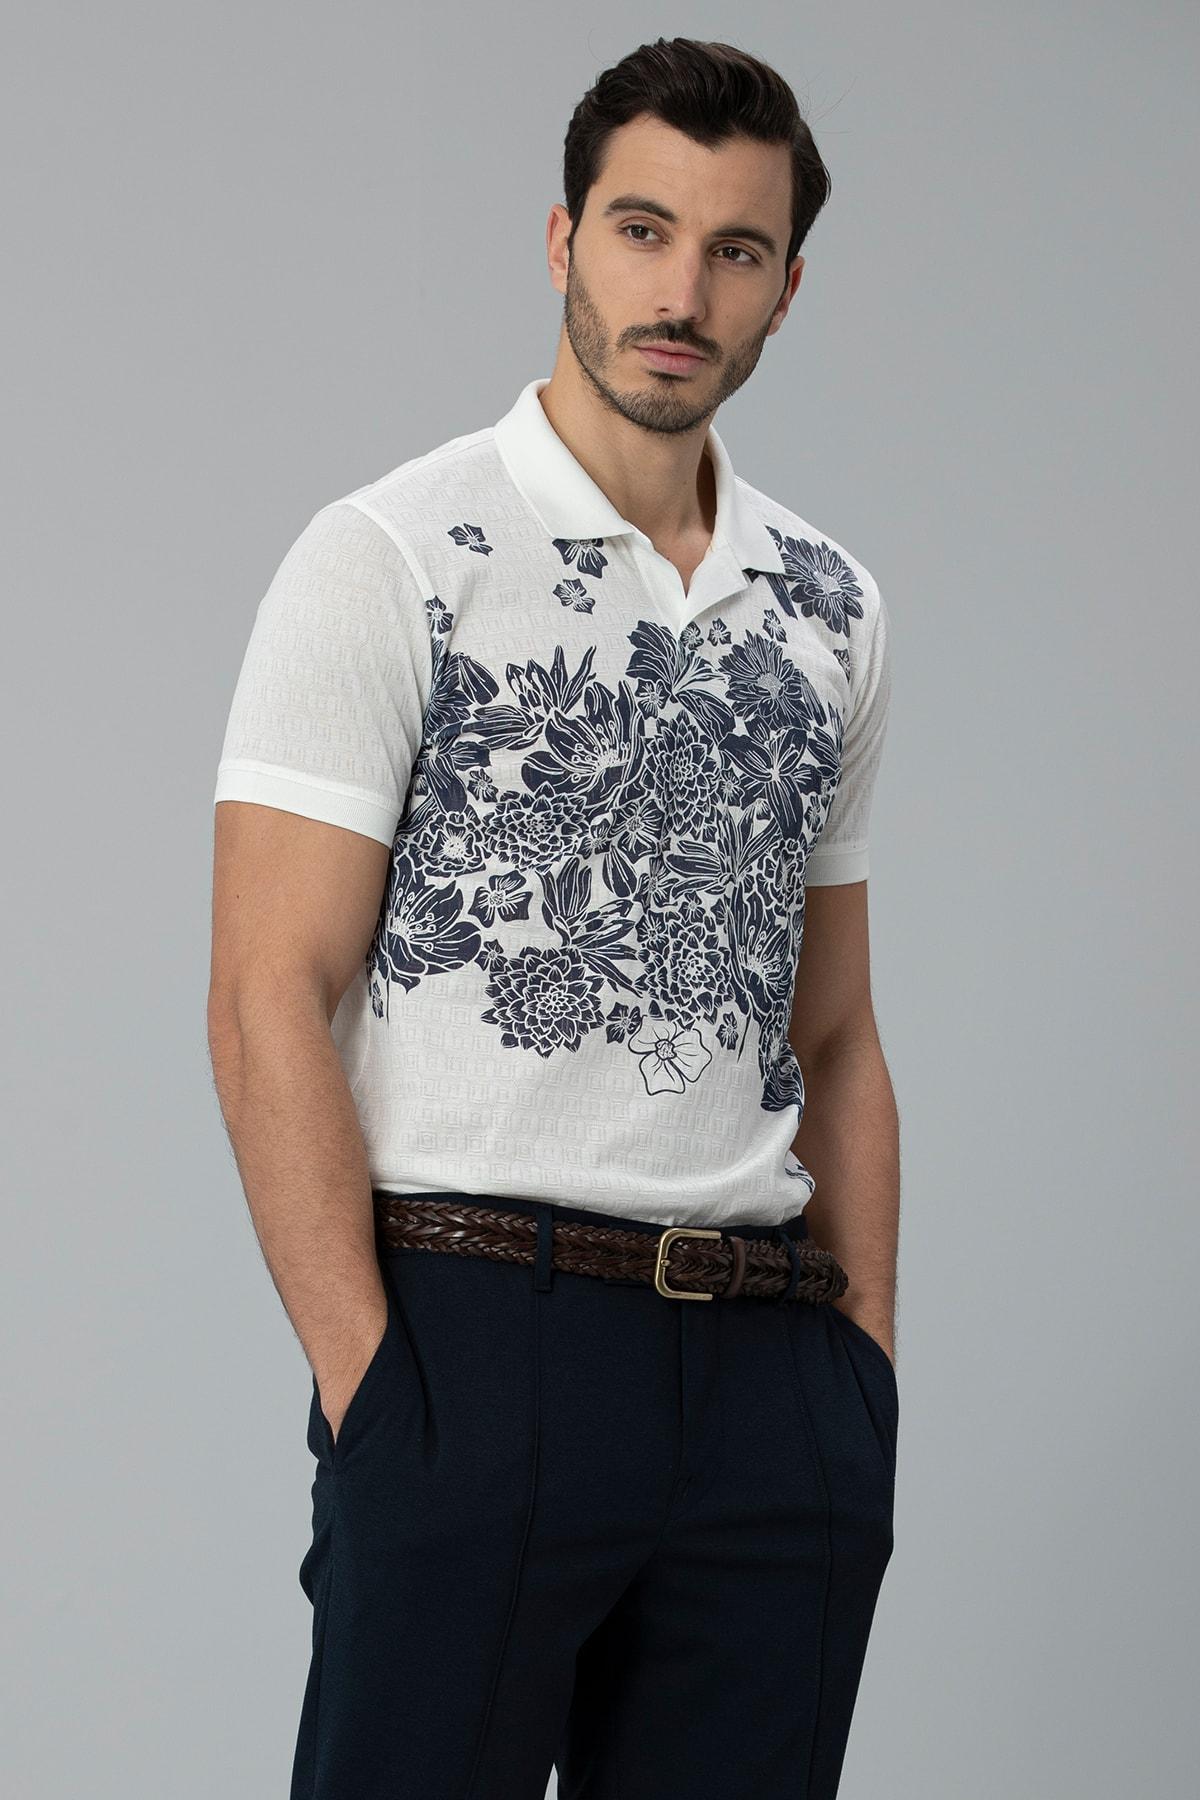 Lufian Matera Spor Polo T- Shirt Kırık Beyaz